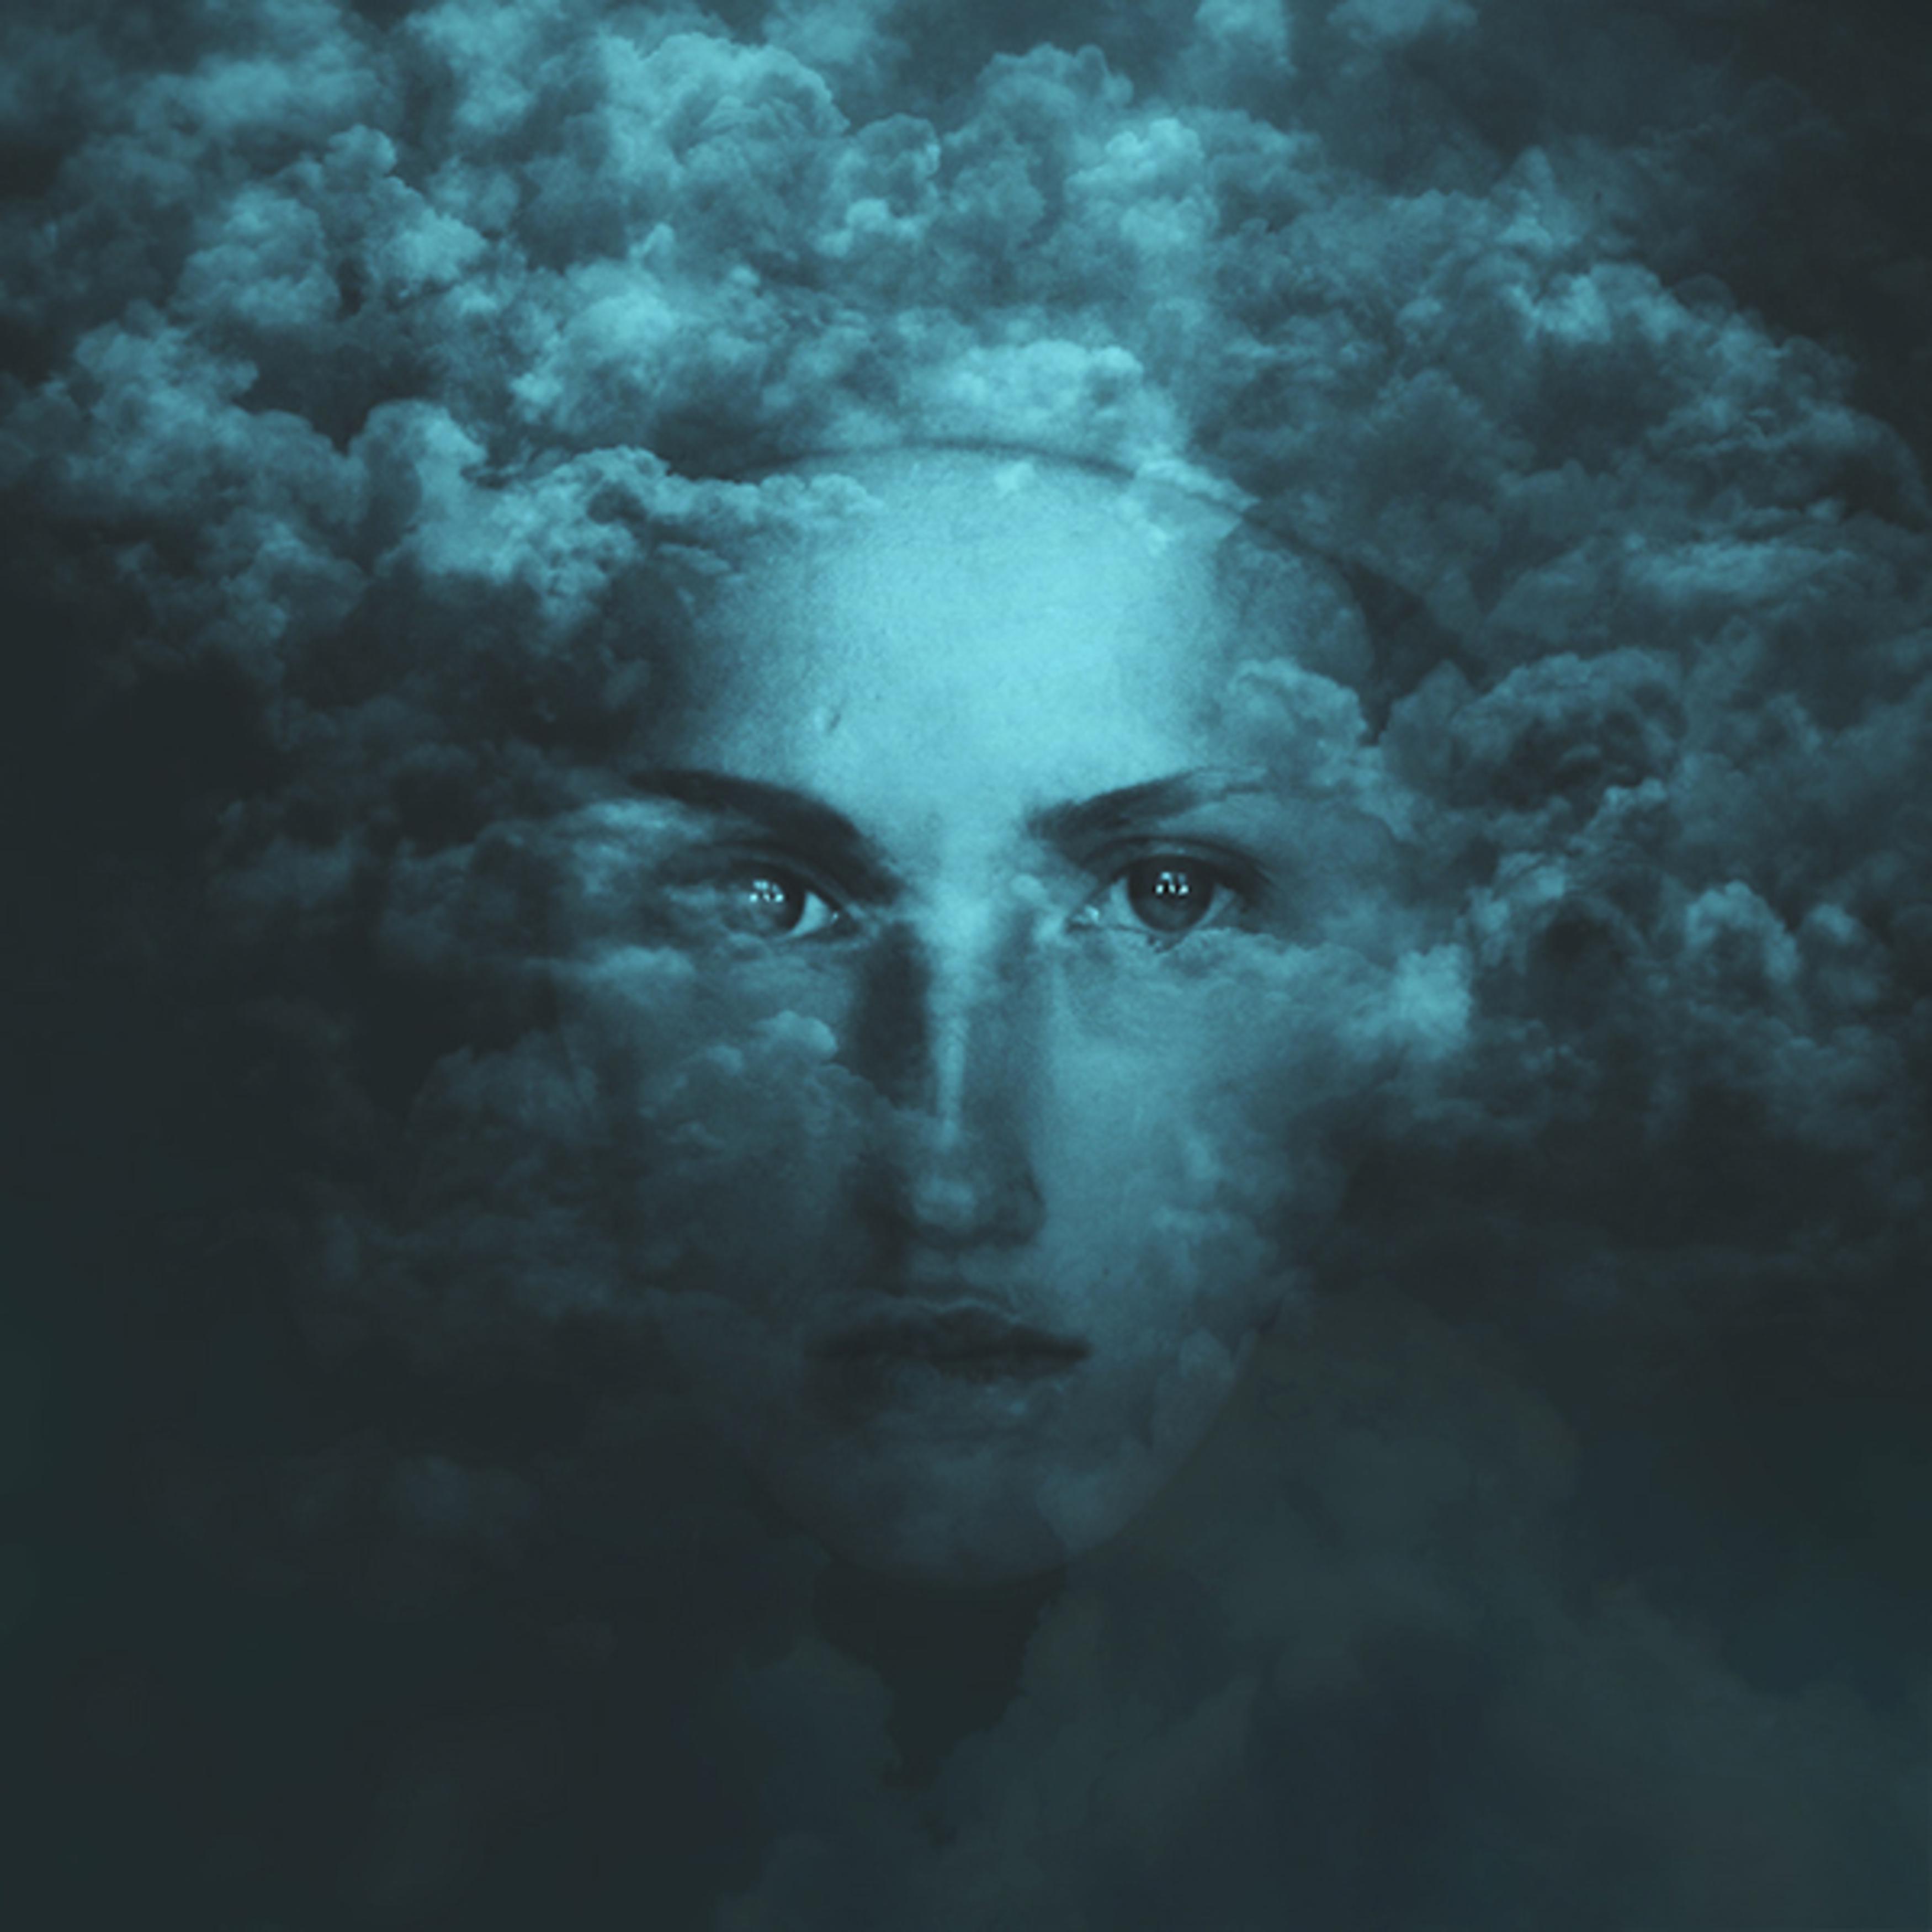 Лицо девушки в облаках фото